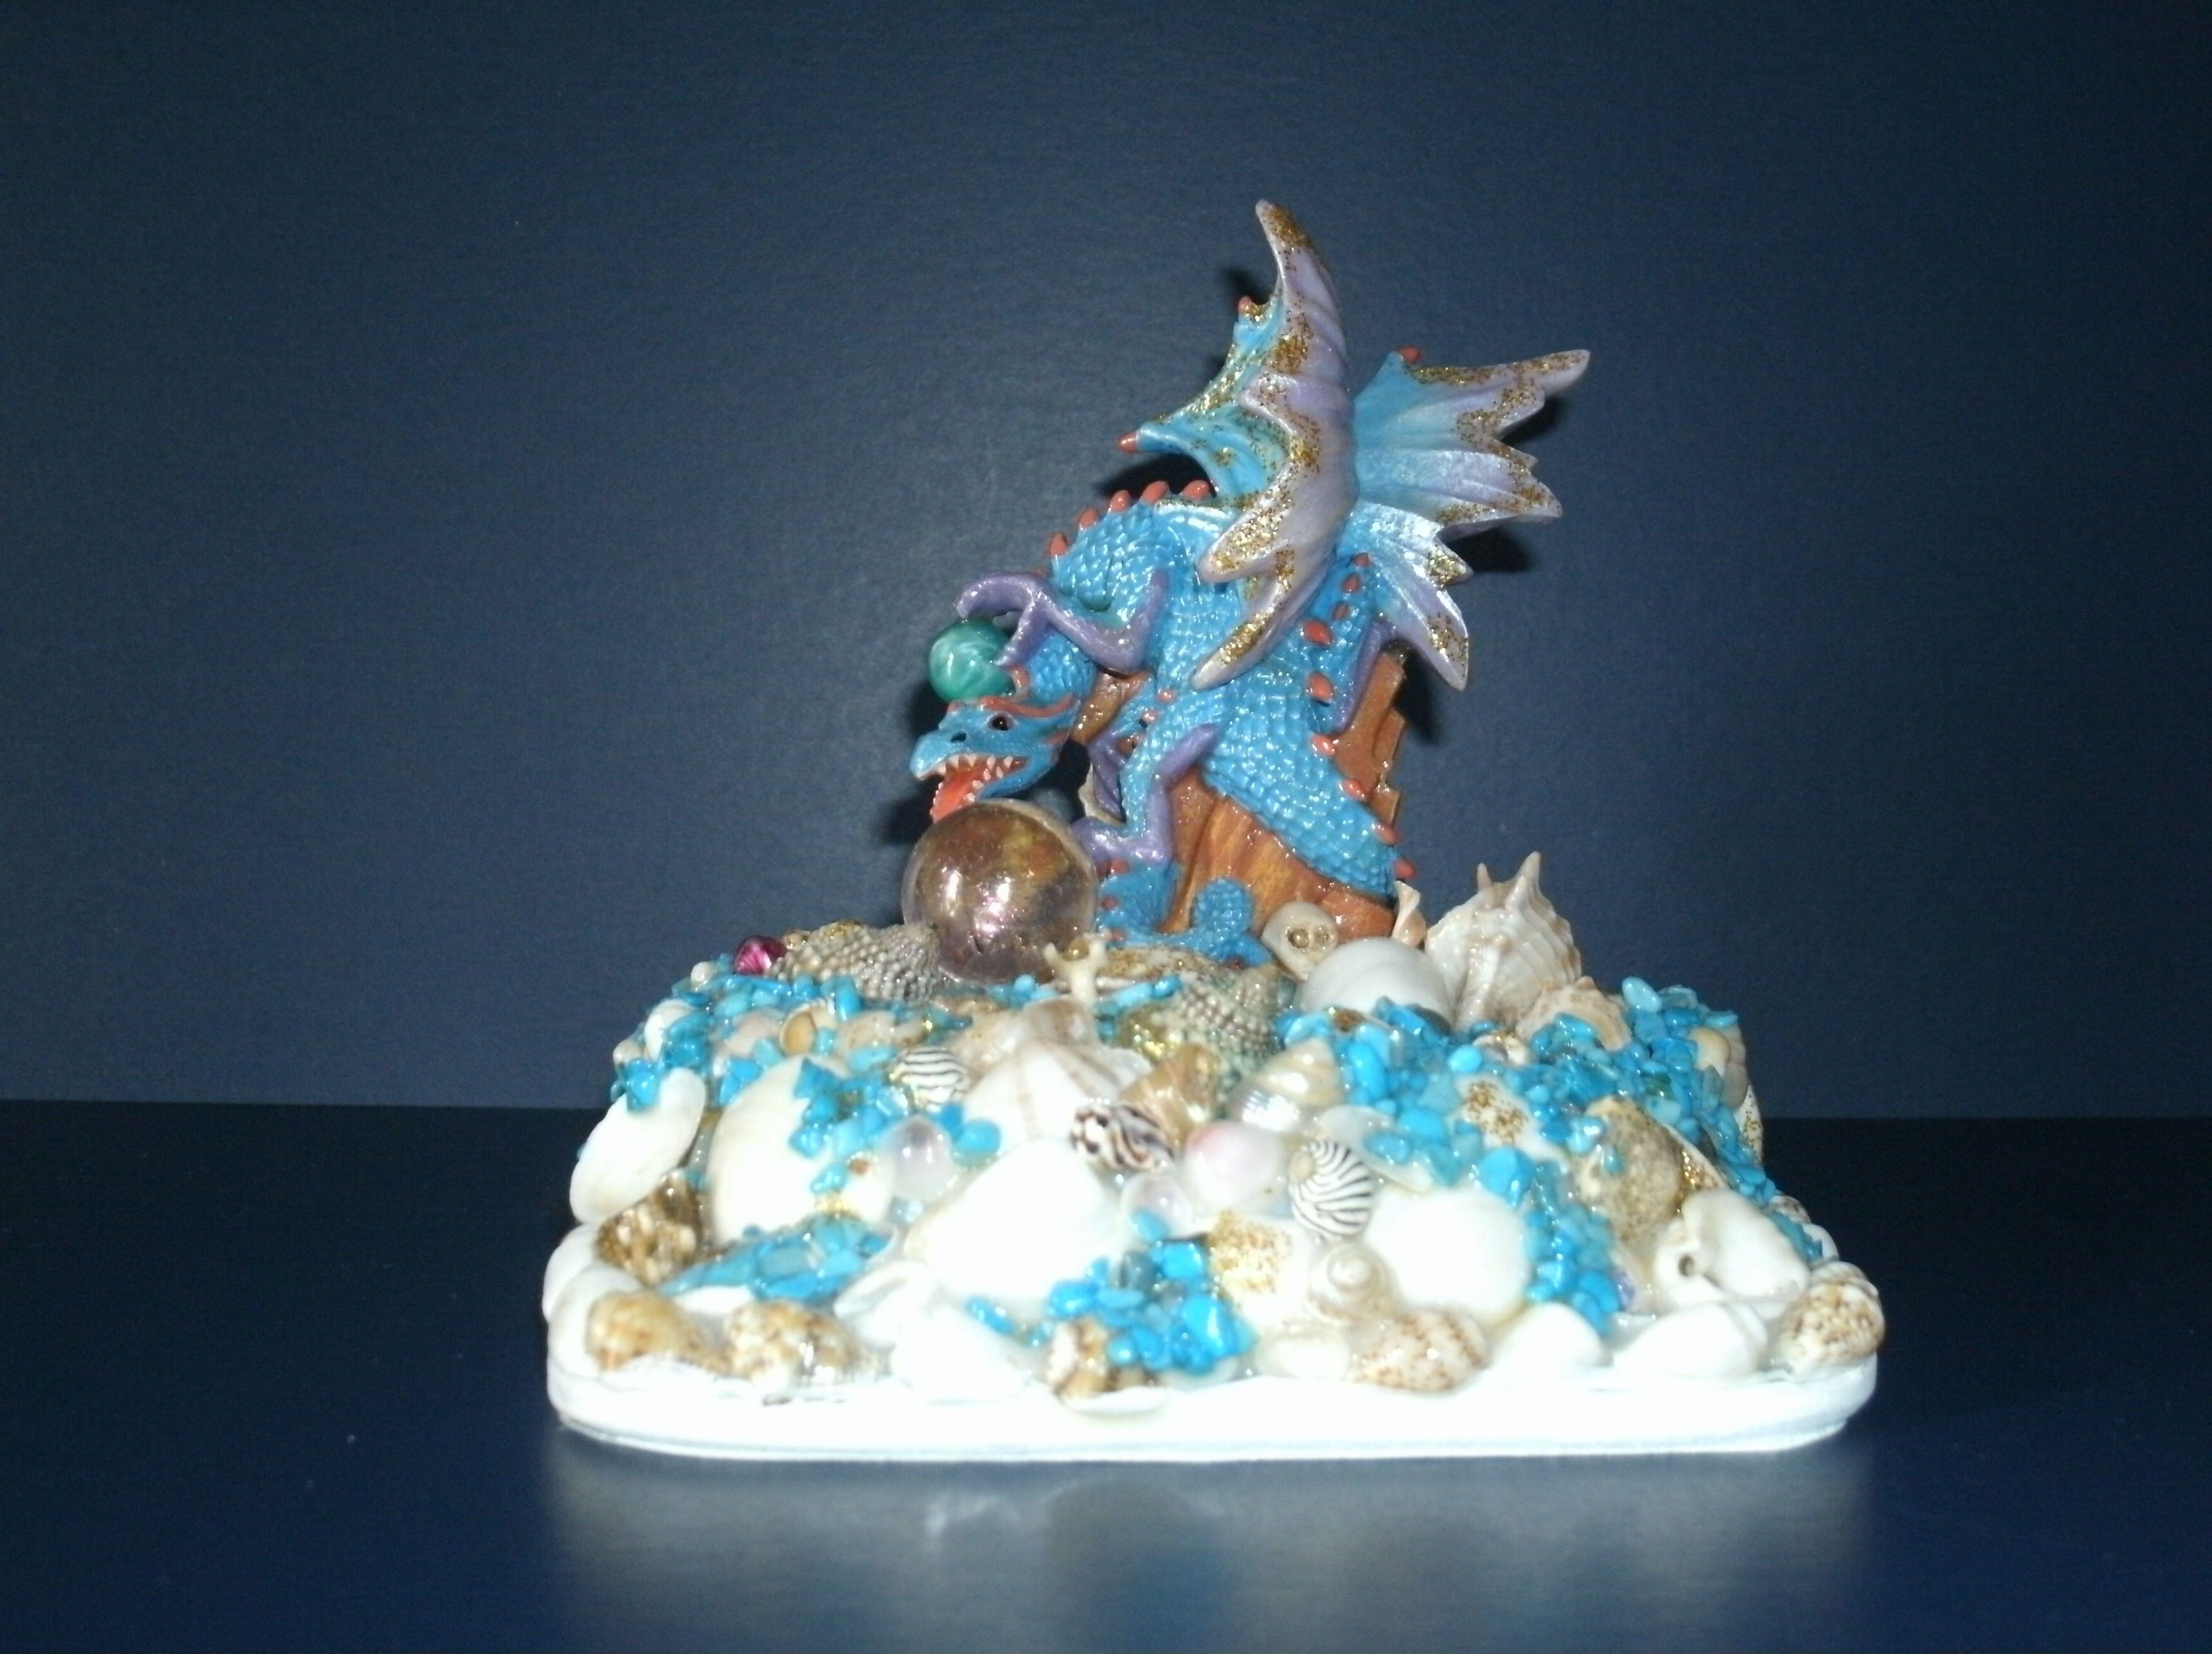 Dragon ornament handmade by Joan Croll